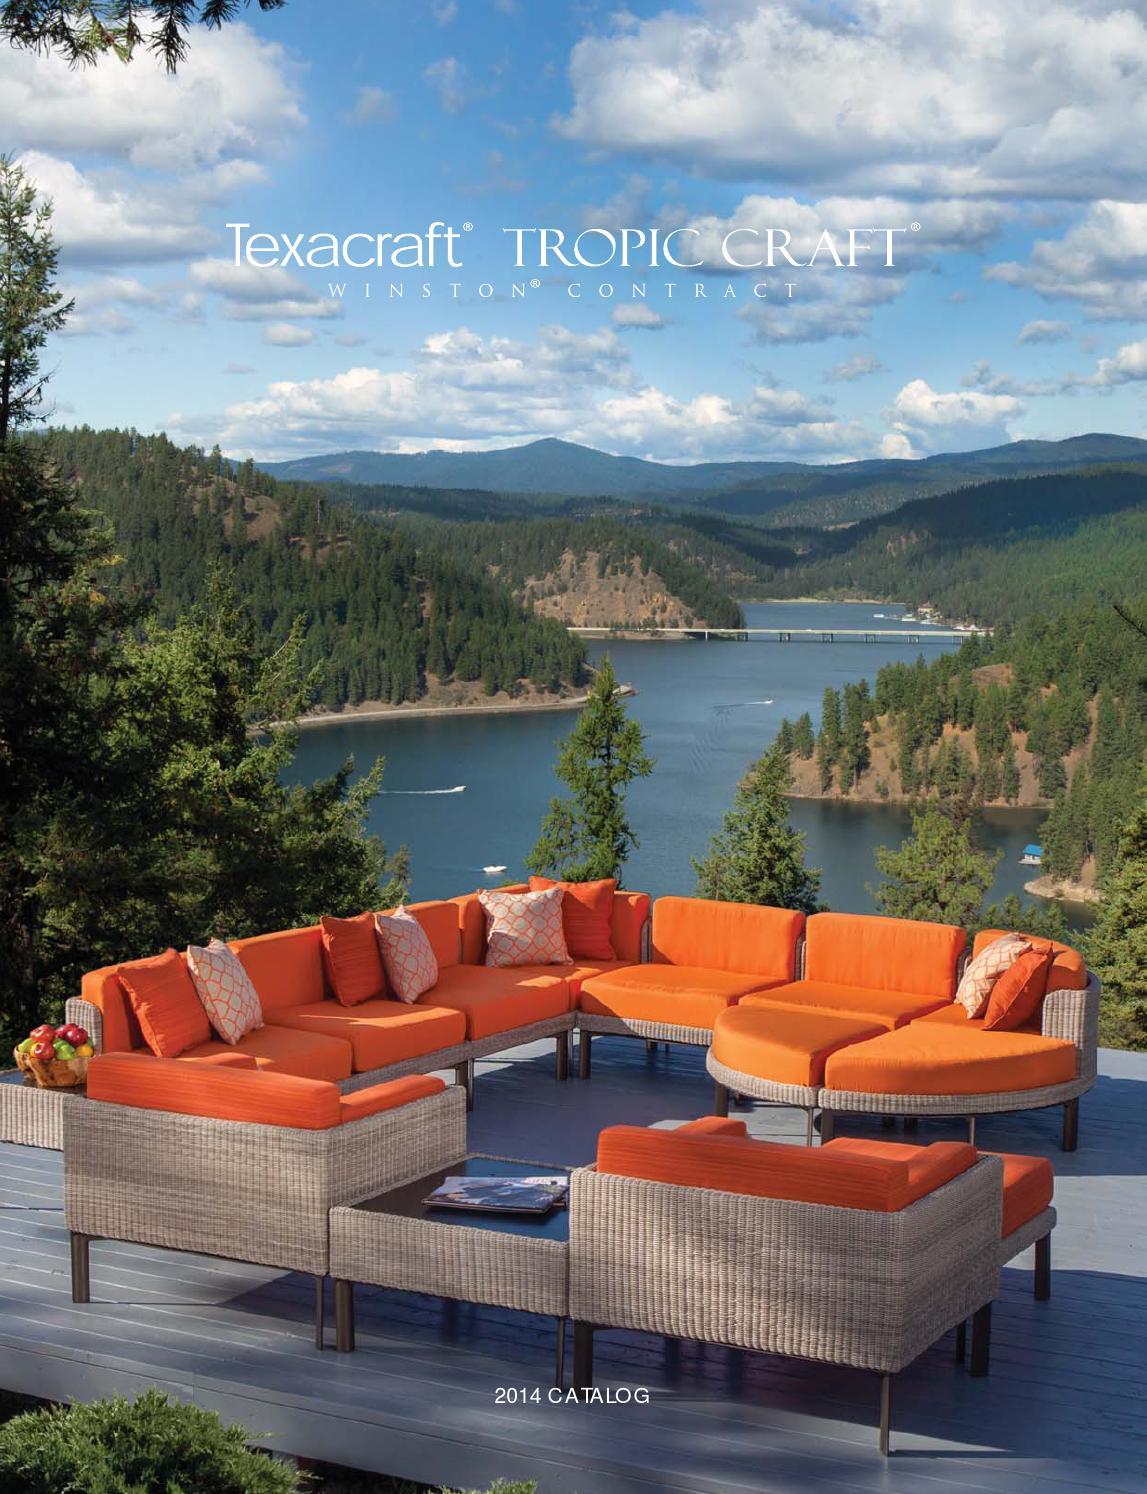 2014 TexacraftR Tropic CraftR WinstonR Contract Furniture By Winston